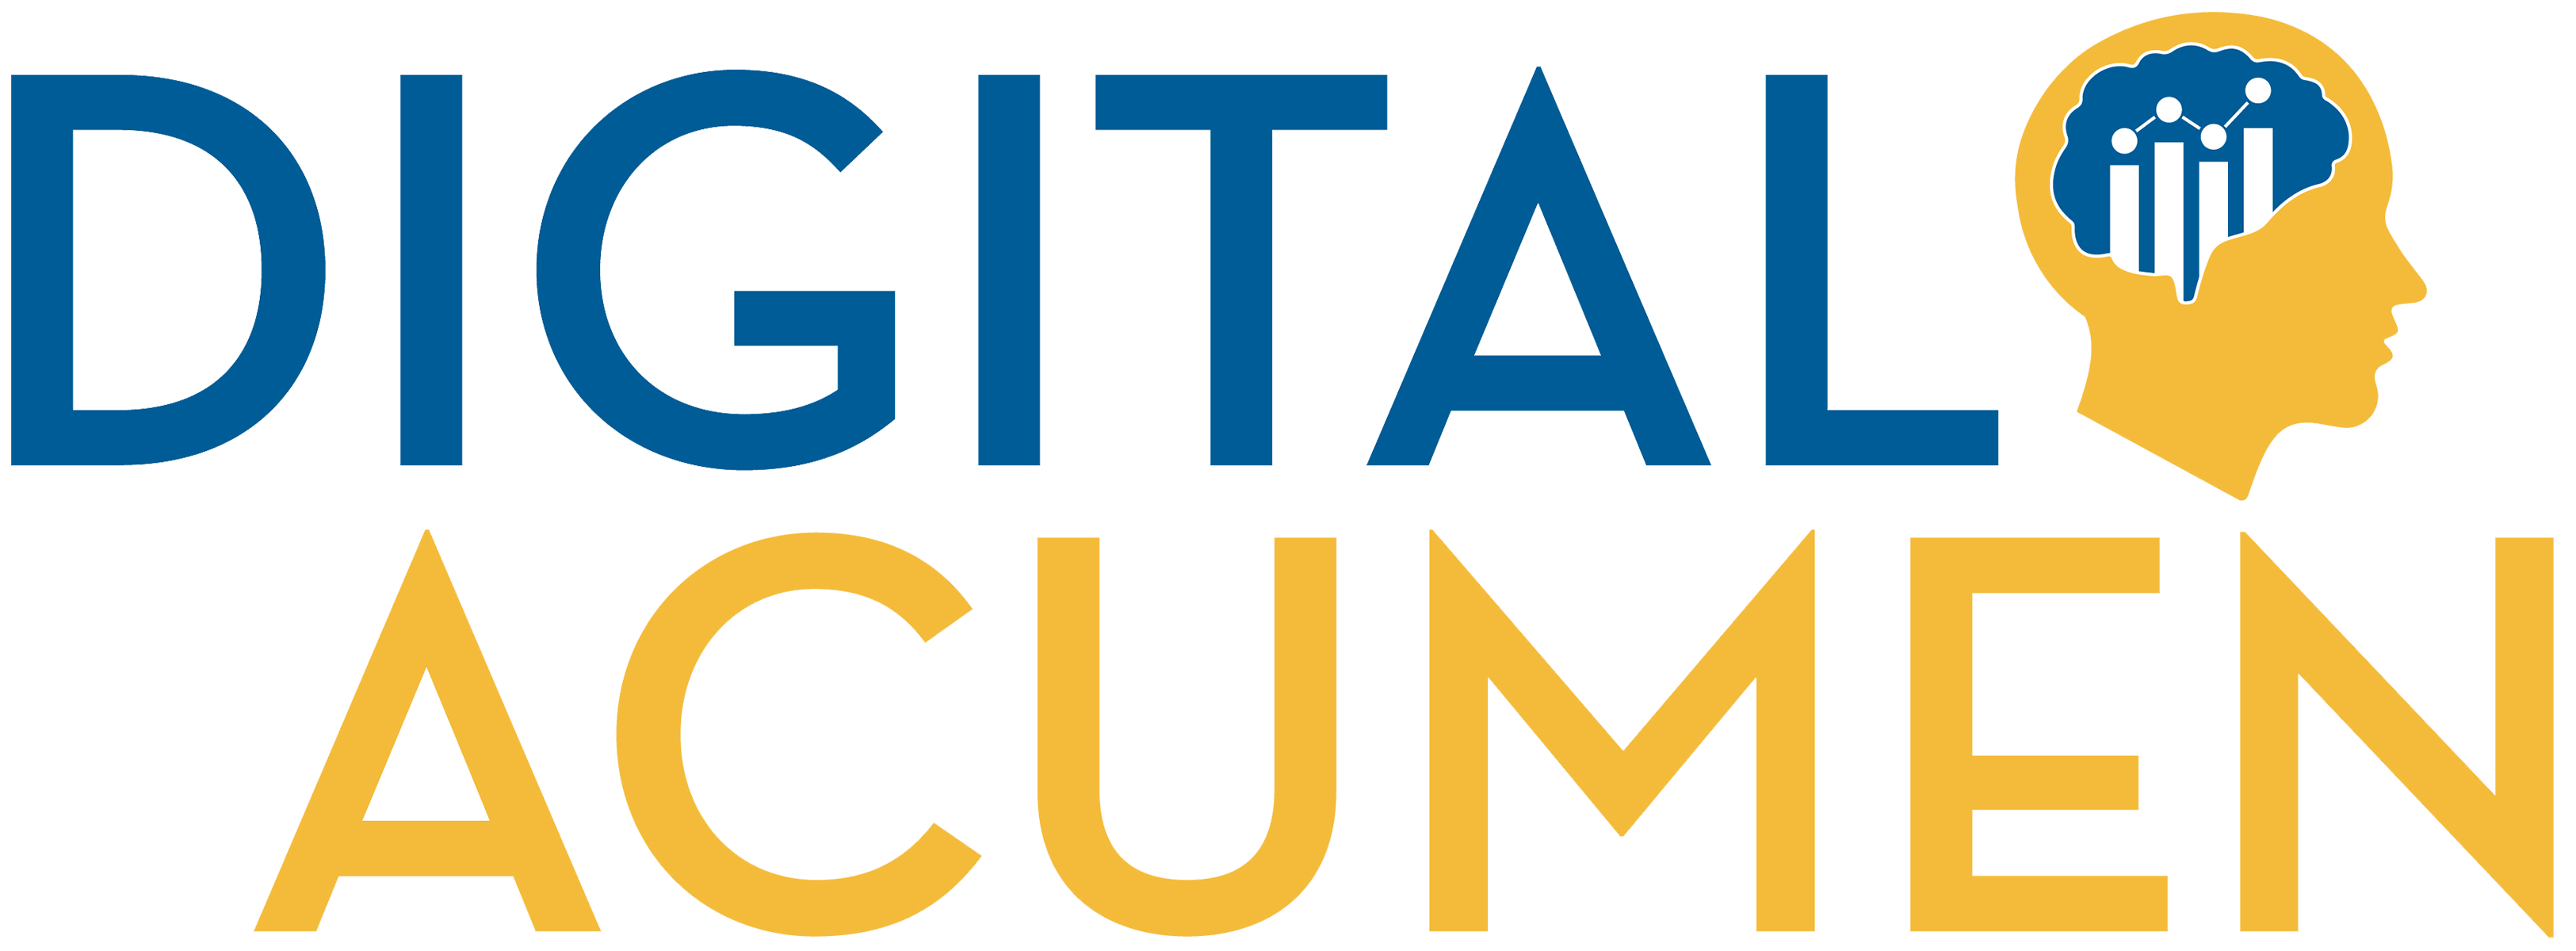 Digital Acumen